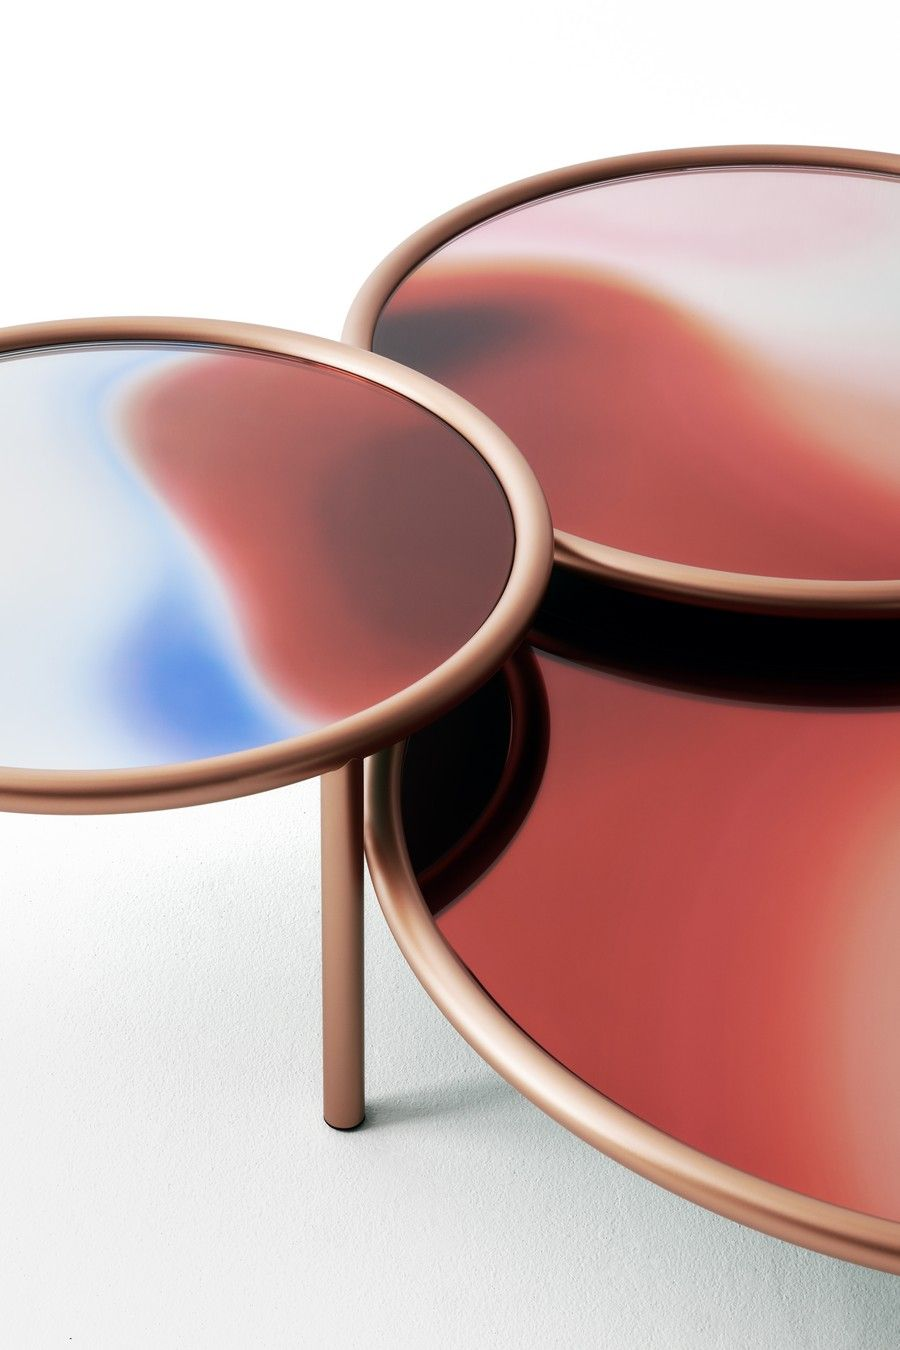 Find Milan Design Week S Novelties Brands Here Https Www Milandesignagenda Com Milan Design Week Novelties Brands Glass Table Coffee Table Glass Furniture [ jpg ]